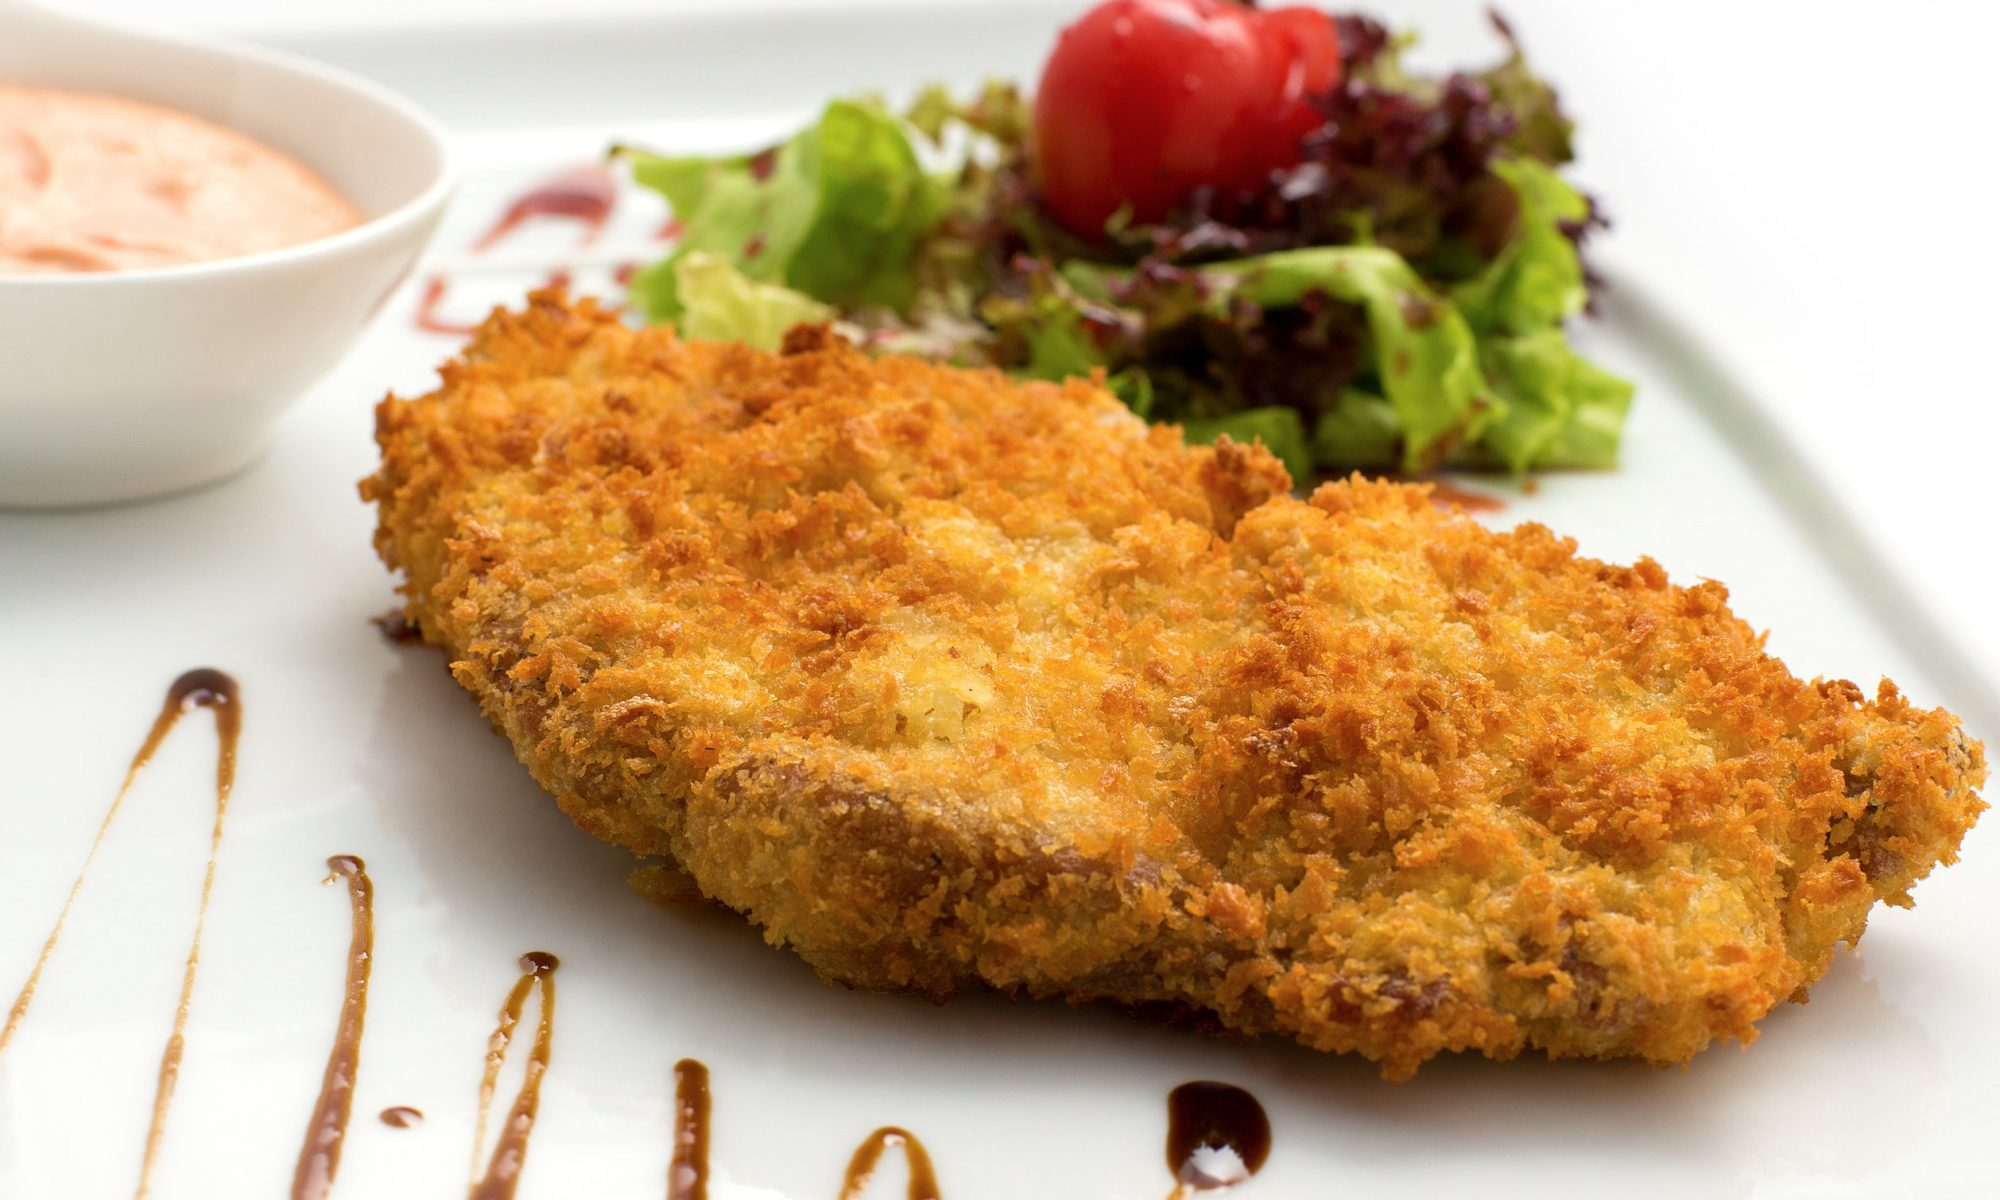 Мясо в кляре: рецепт приготовления